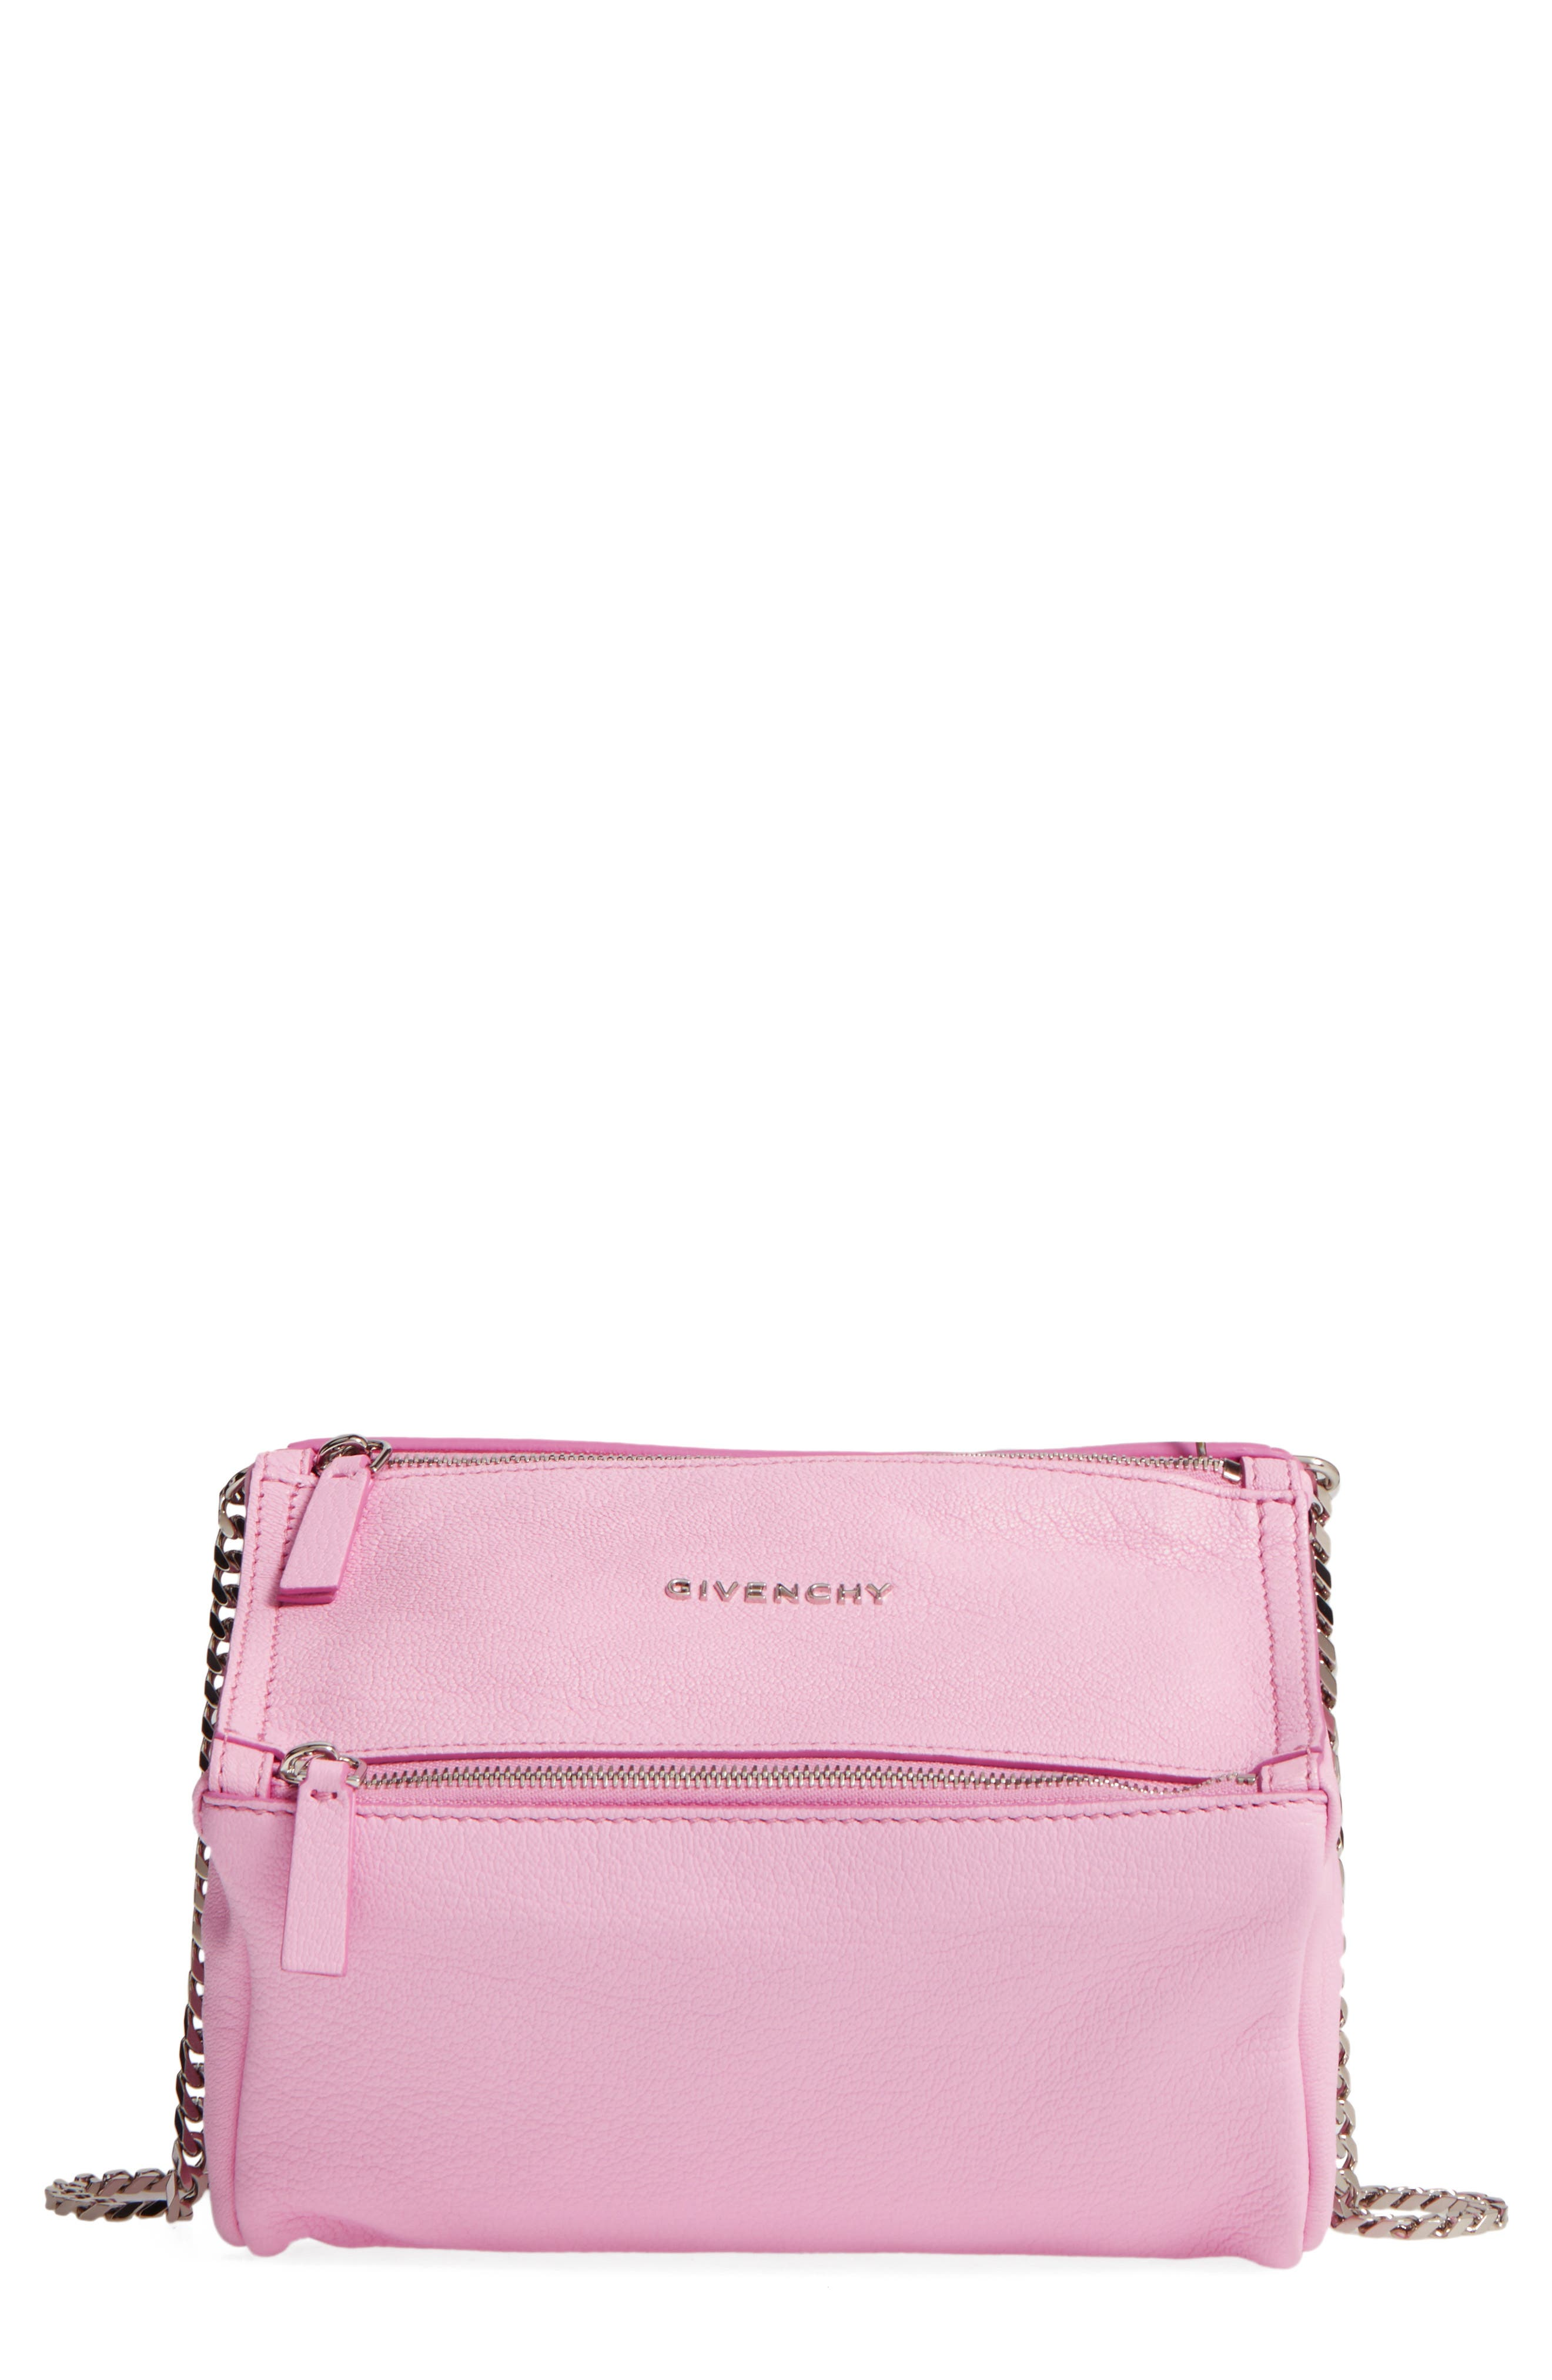 Alternate Image 1 Selected - Givenchy Mini Pandora Sugar Leather Shoulder Bag